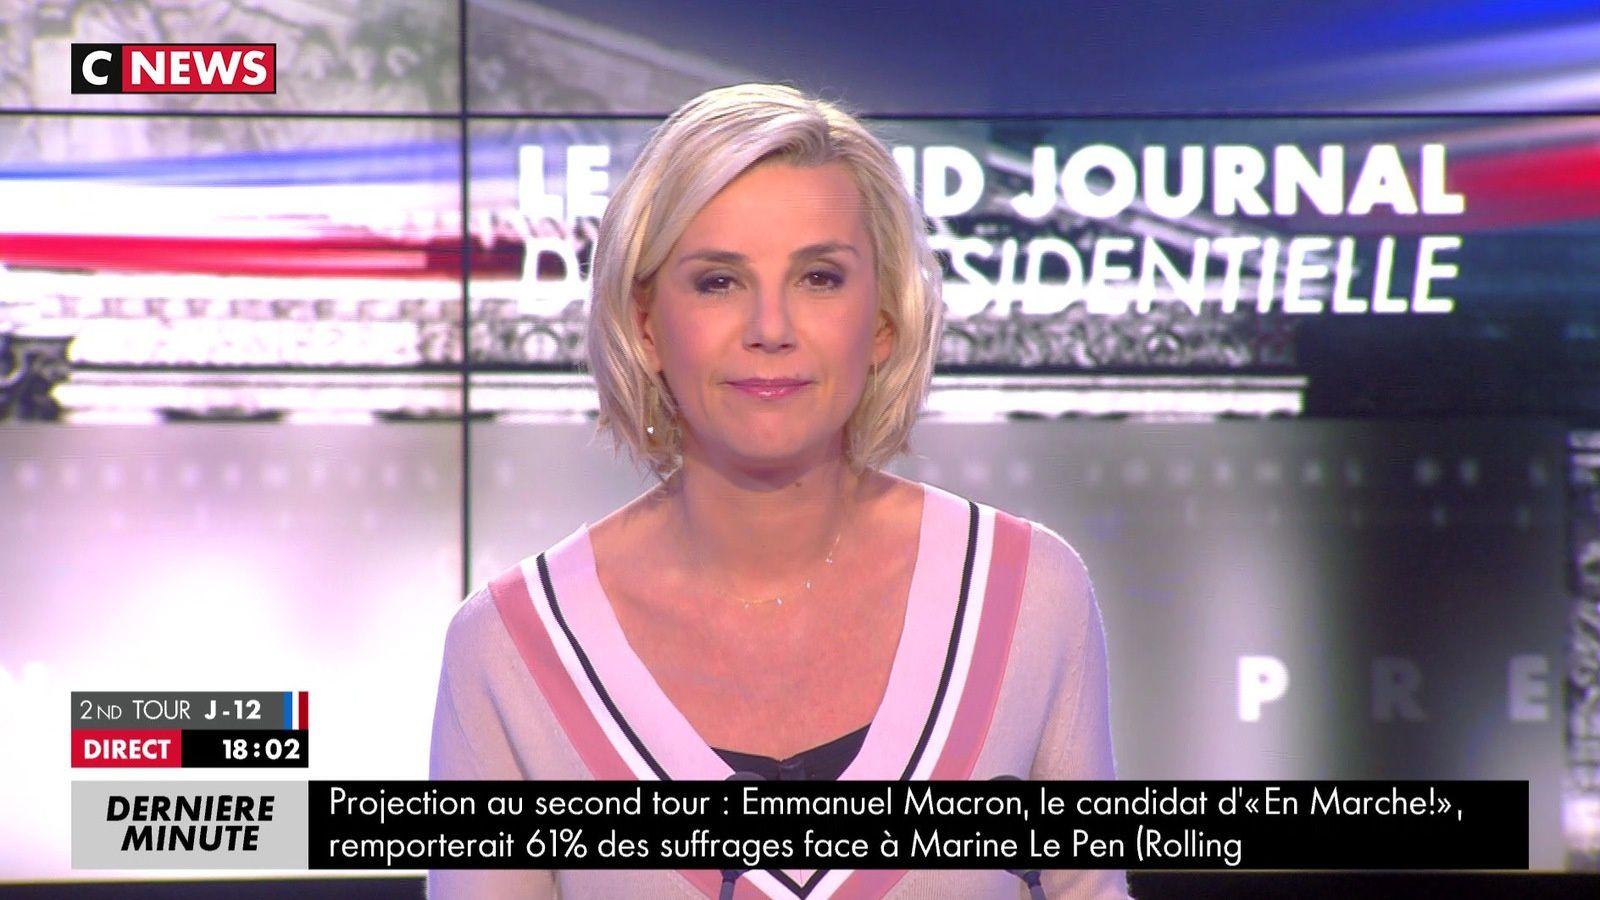 📸6 LAURENCE FERRARI @LaurenceFerrari ce soir @CNEWS #ElectionPresidentielle2017 #vuesalatele